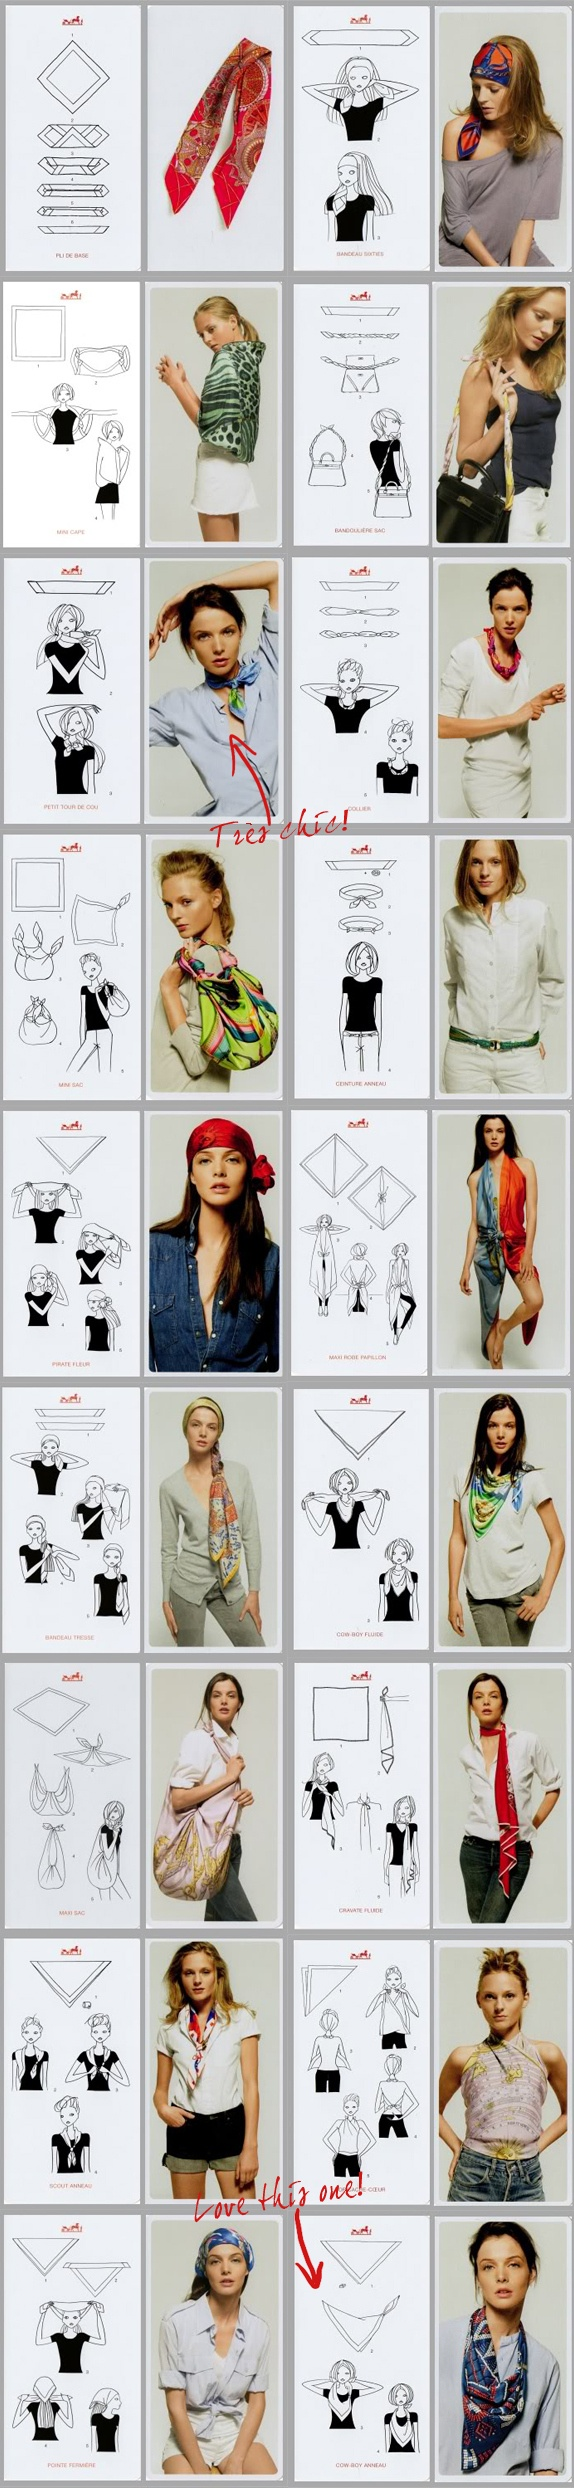 Tying a Hermes scarf. | Fashion Inspiration | Pinterest